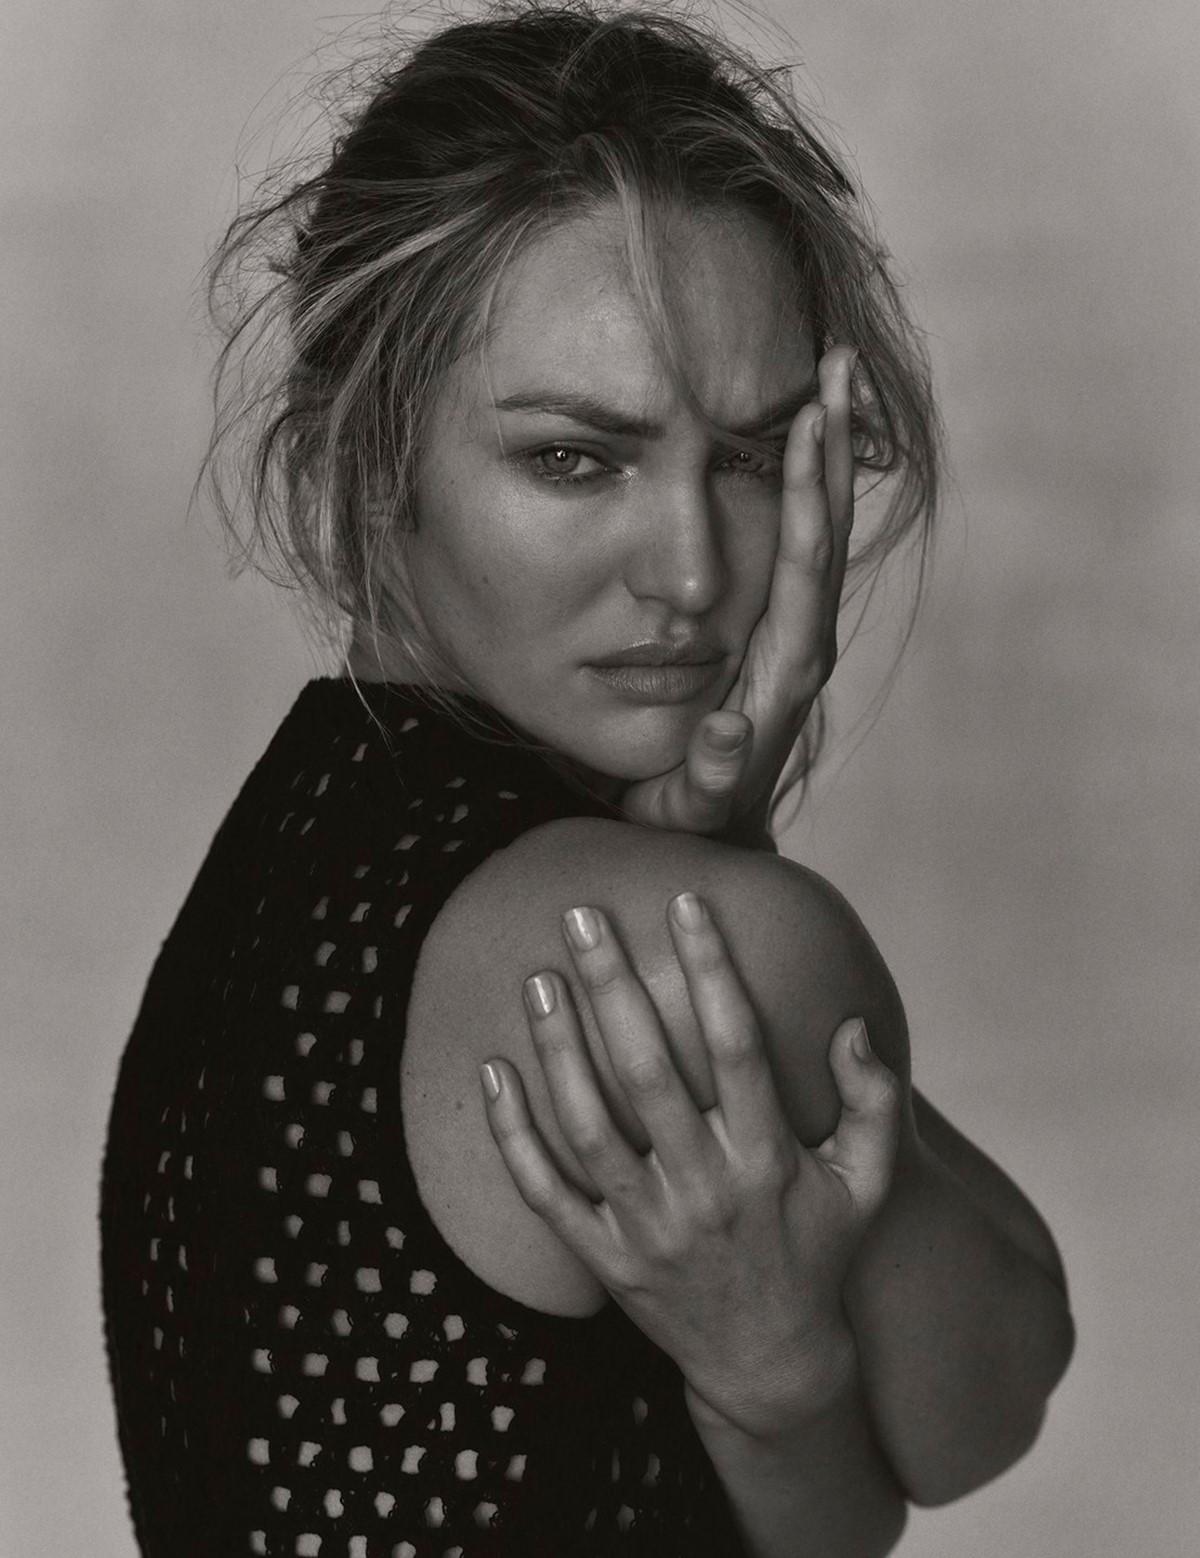 Irina Shayk, Candice Swanepoel and Joan Smalls cover Vogue Greece December 2020 by Rowan Papier